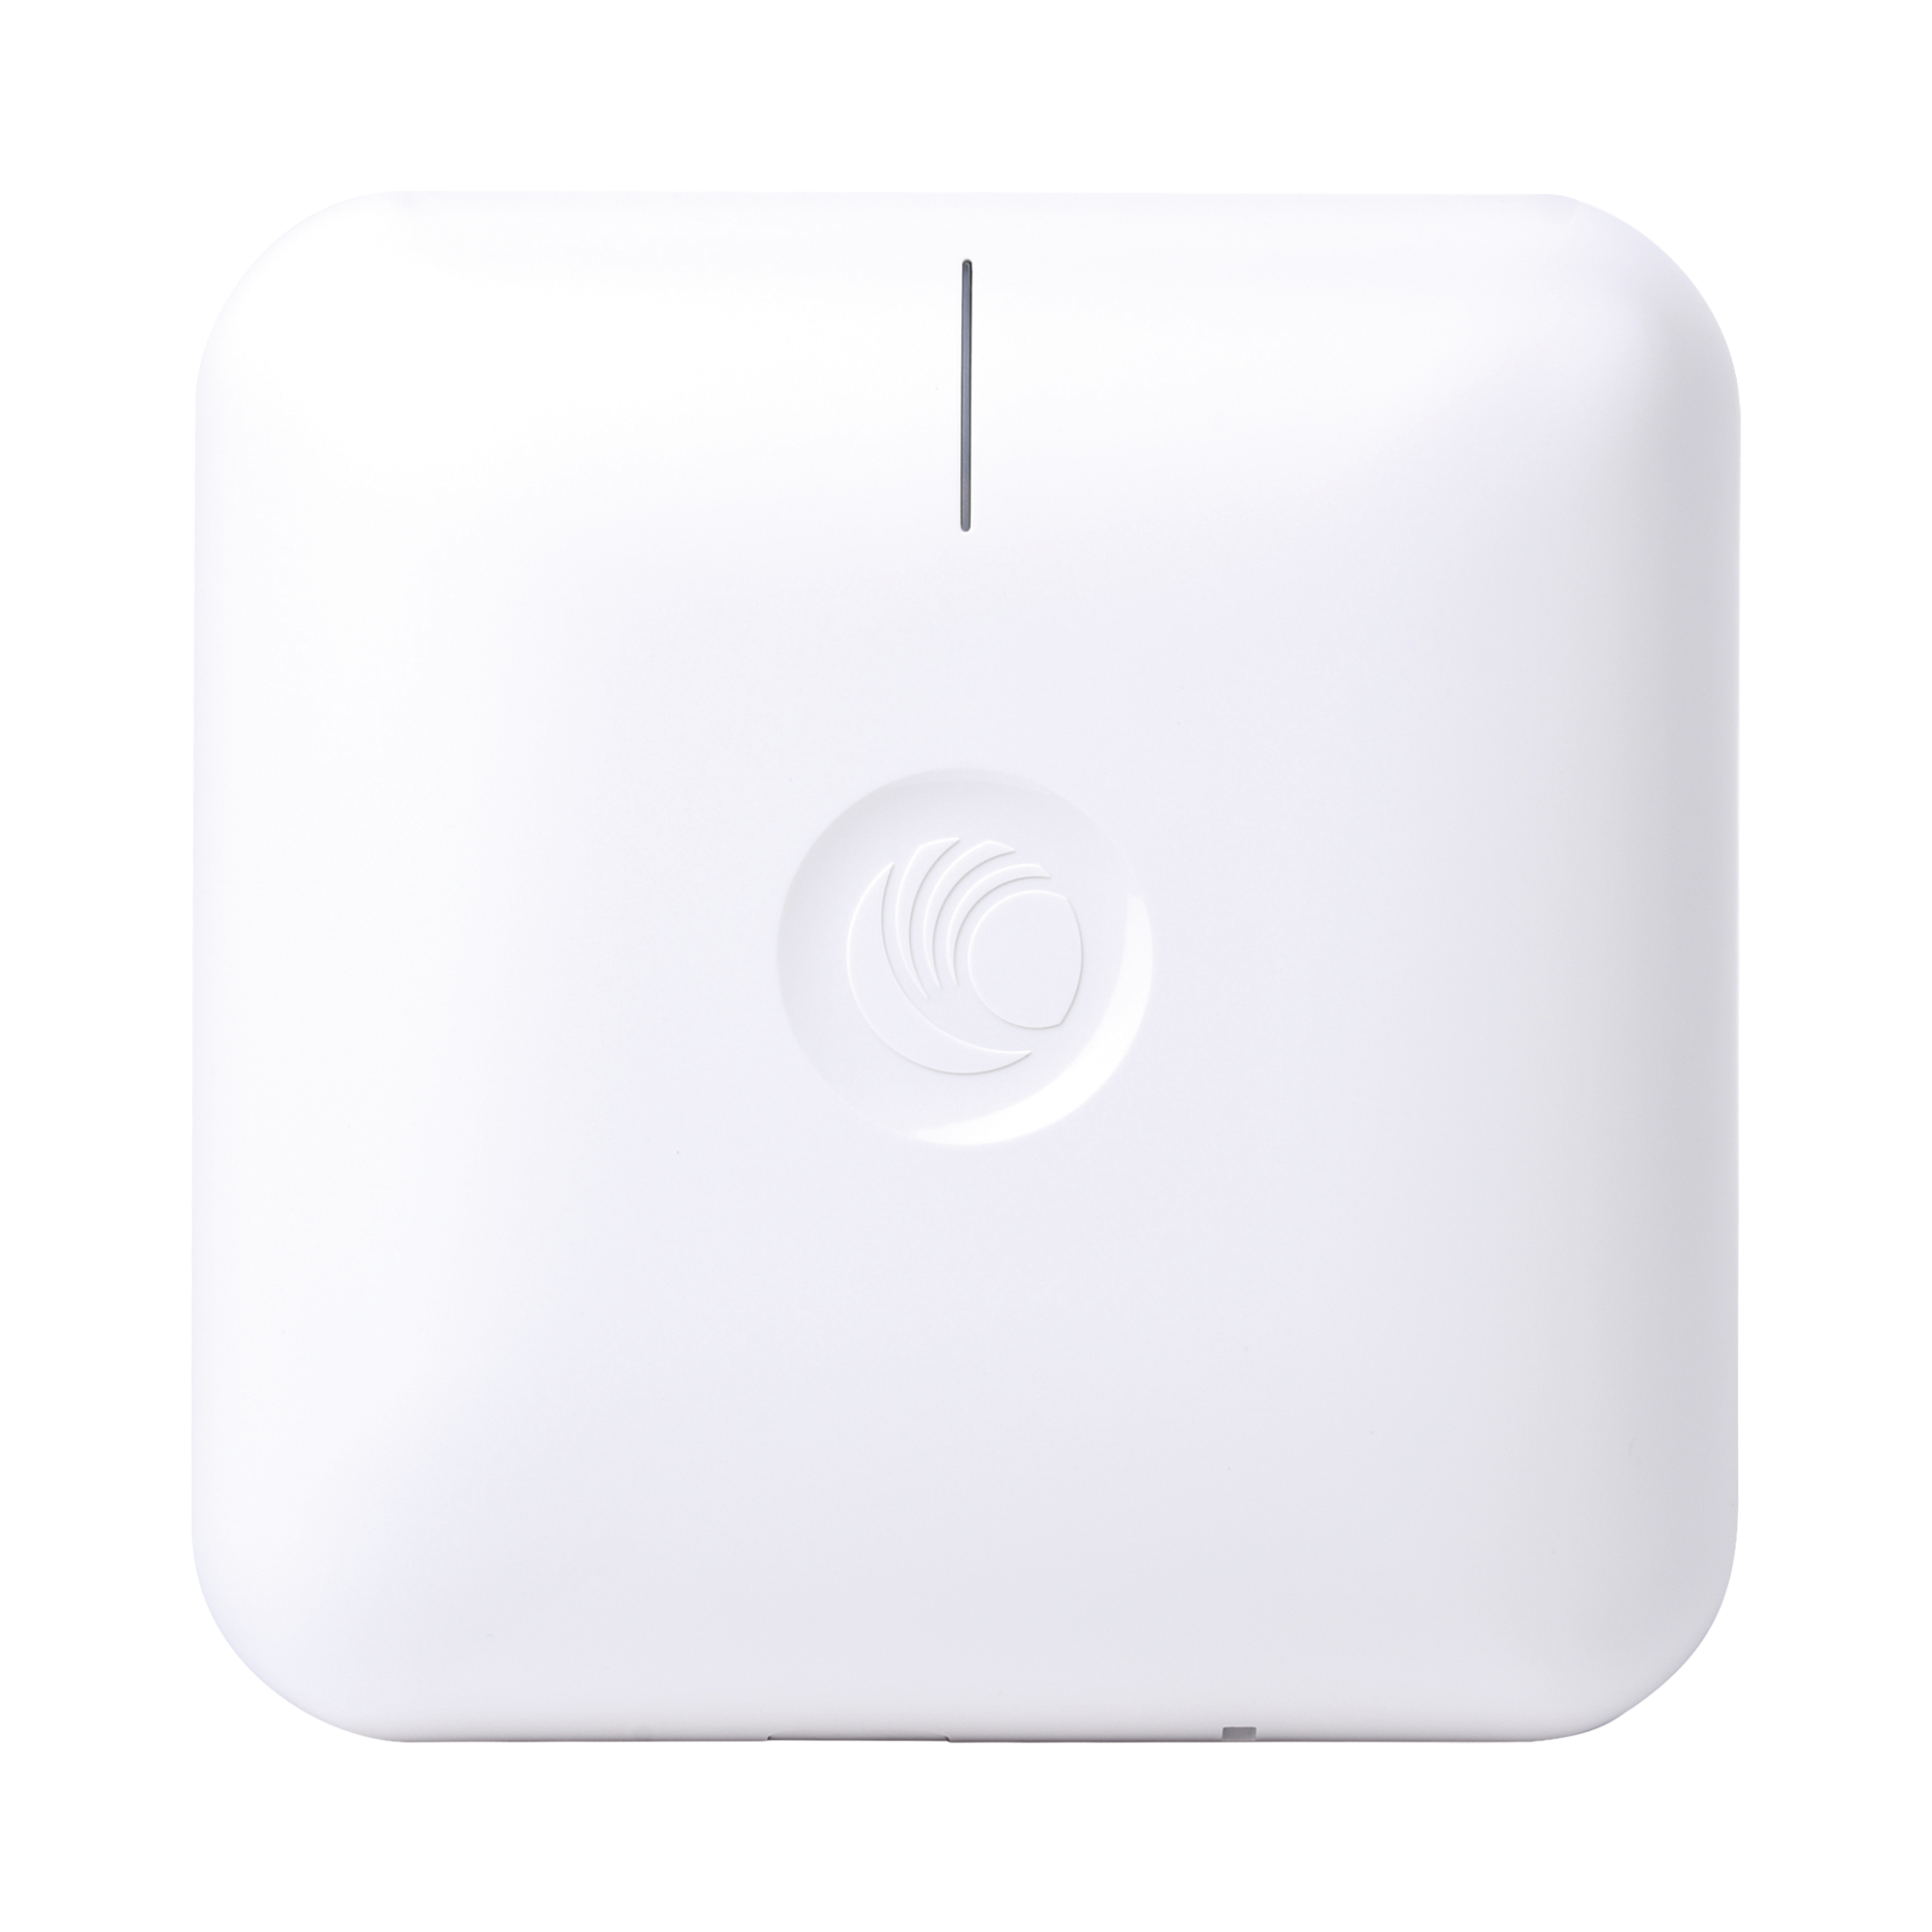 Access Point WiFi cnPilot e410 Indoor,  Doble Banda, Wave 2, MU-MIMO 2X2, antena Beamforming Omnidireccional, hasta 256 clientes